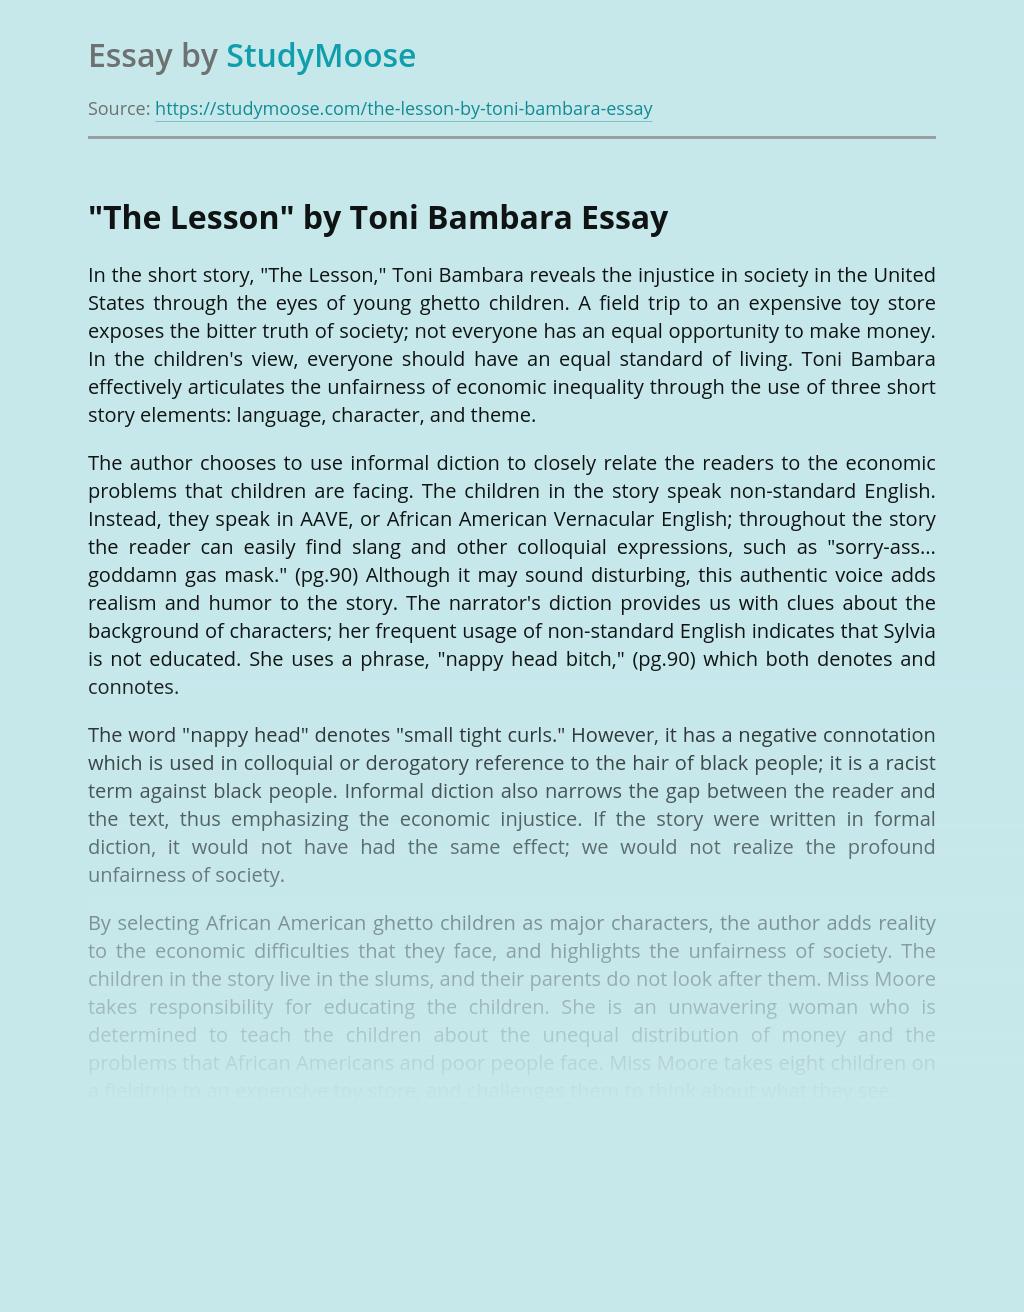 Short STory The Lesson by Toni Bambara